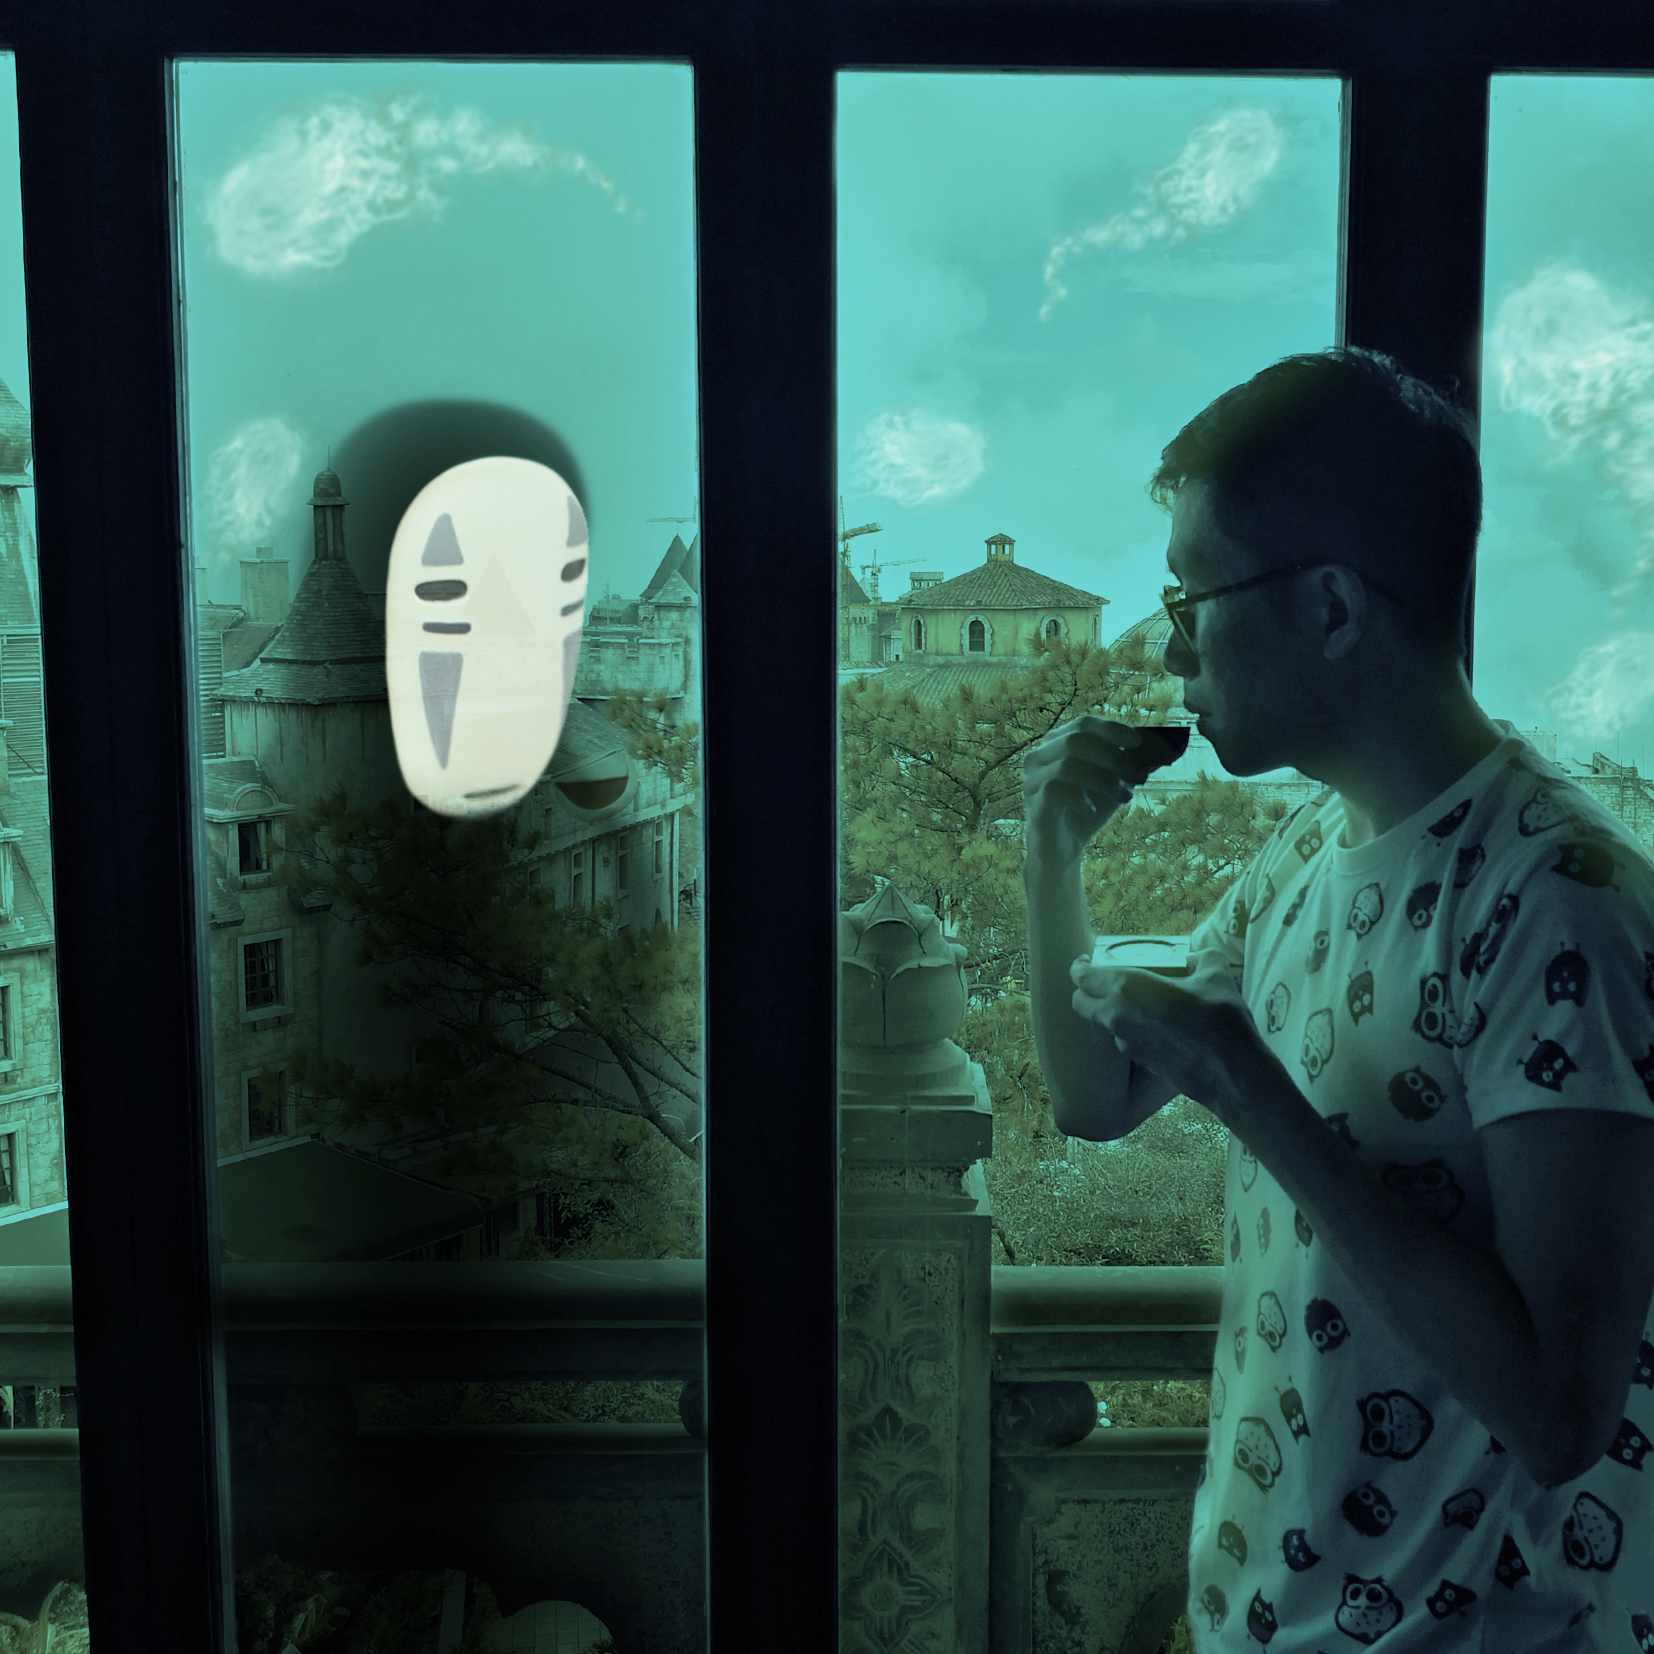 Spirited Away Digital Art by Alvin Sim